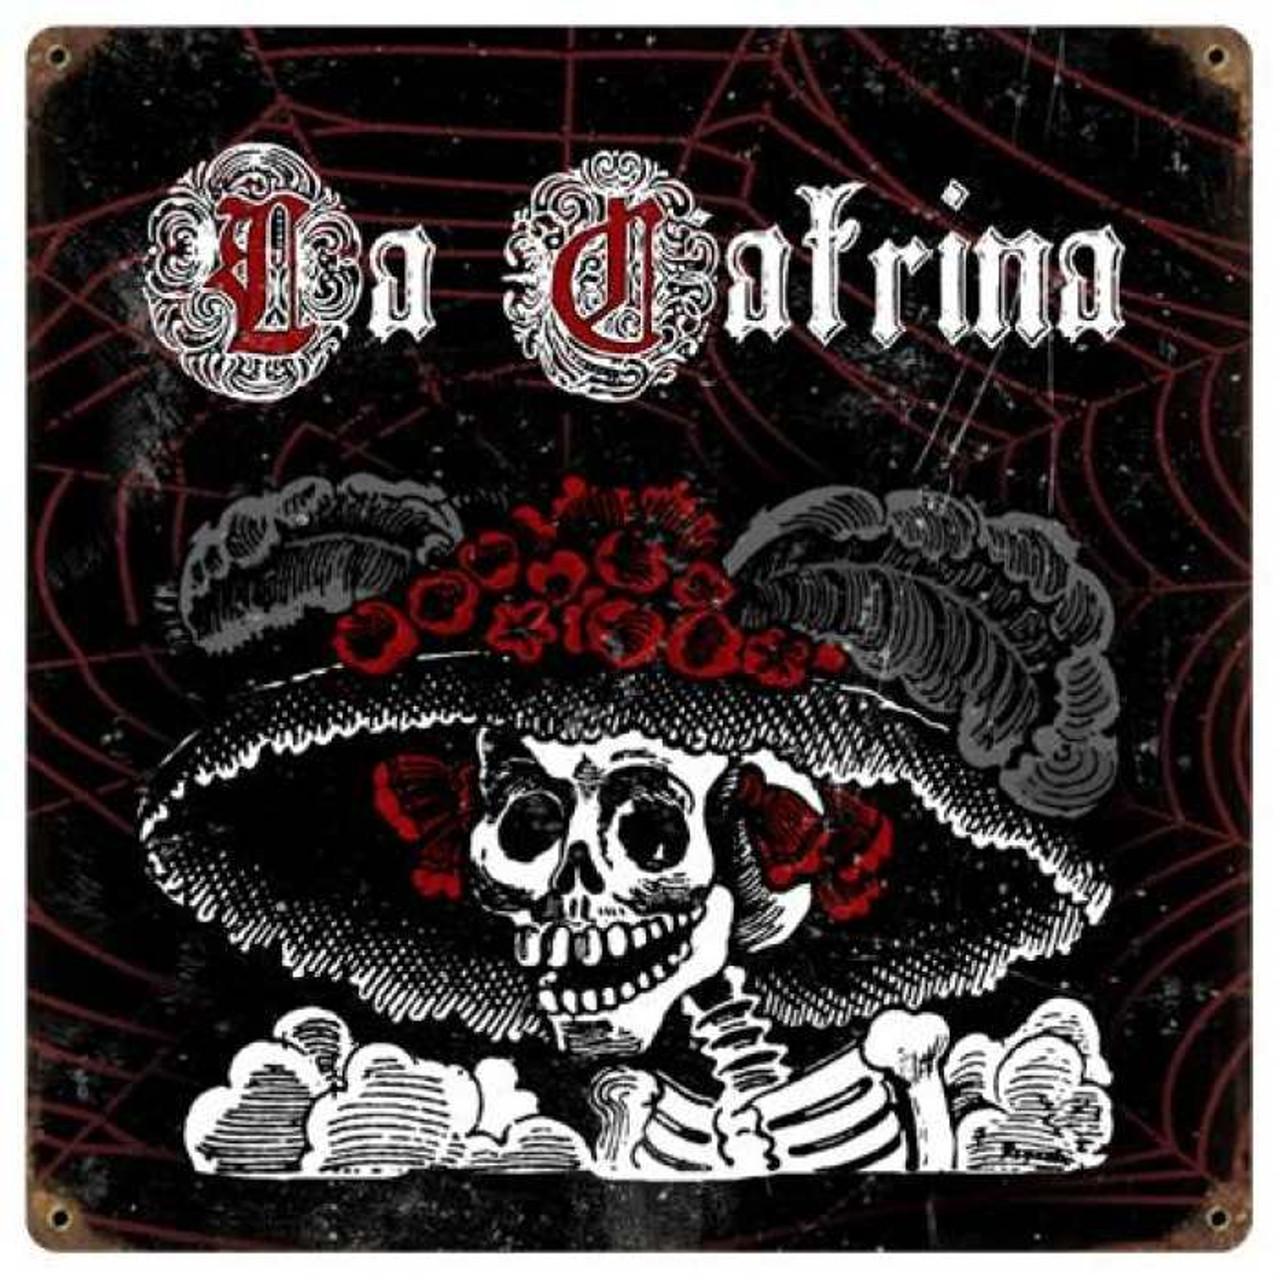 Vintage La Catrina Metal Sign 12 x 12 Inches